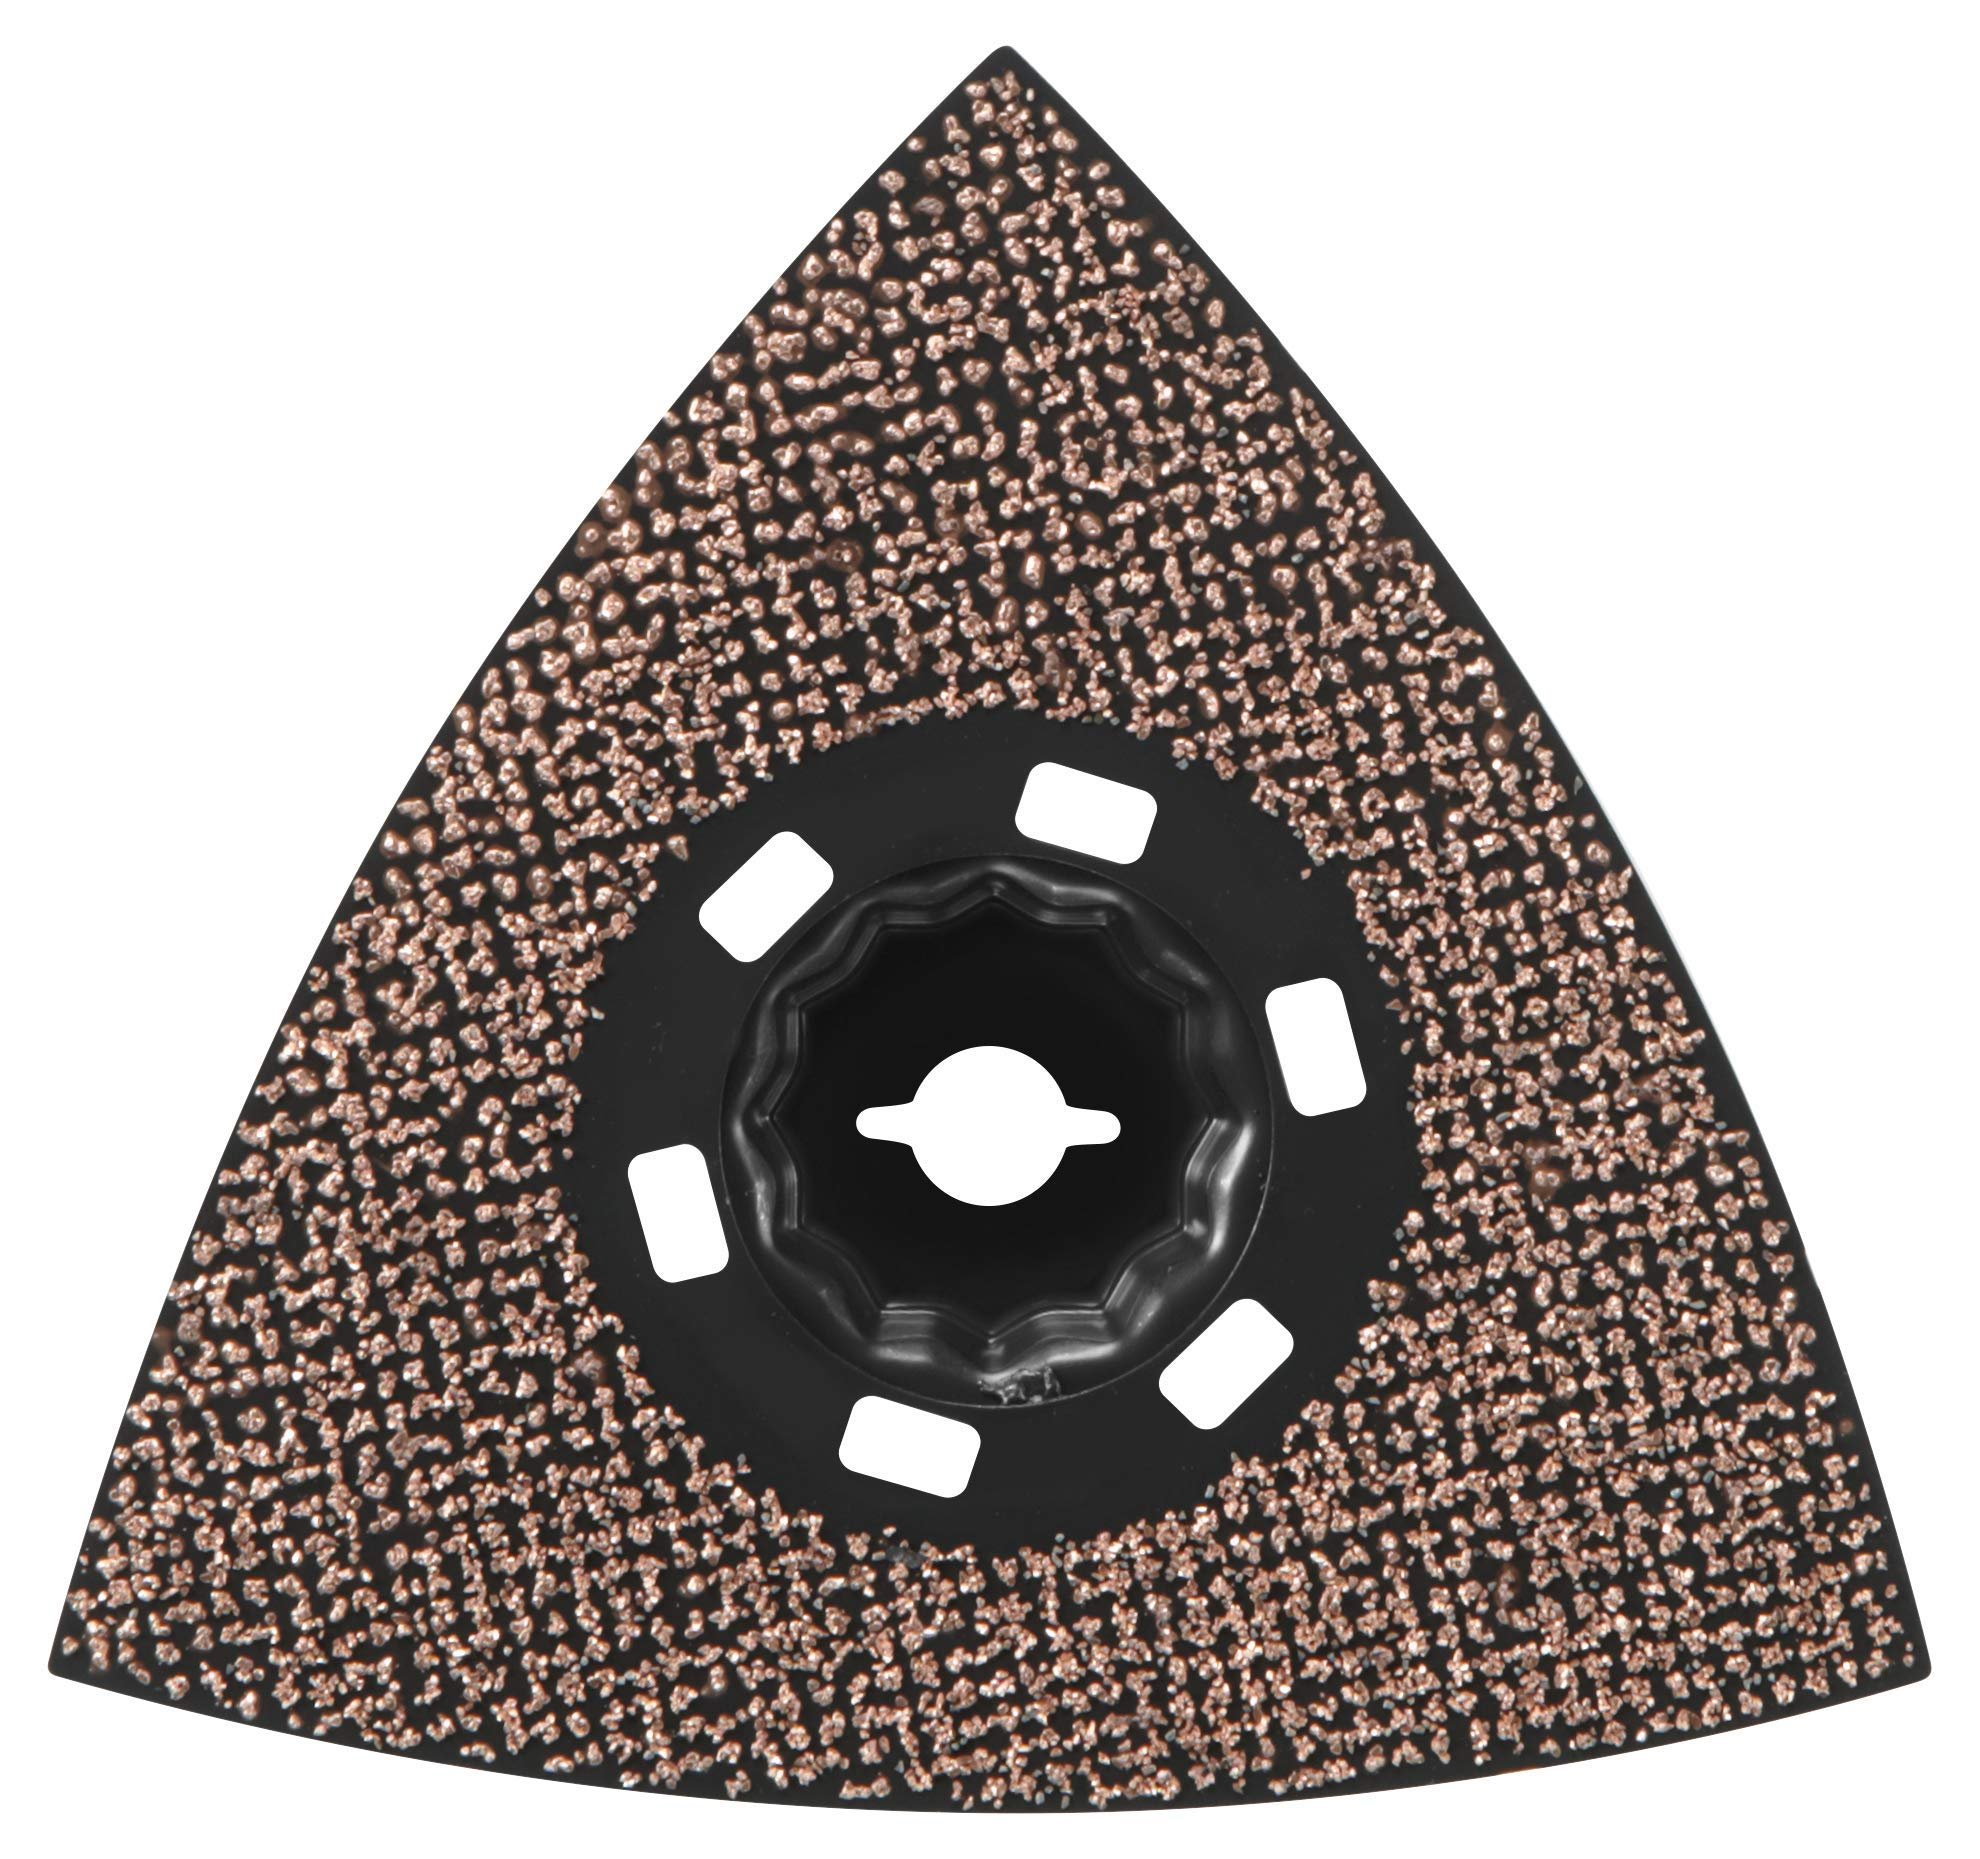 Bosch OSM450CR4 StarlockMax Oscillating Multi-Tool Carbide 40 Grit Delta Sanding Pad